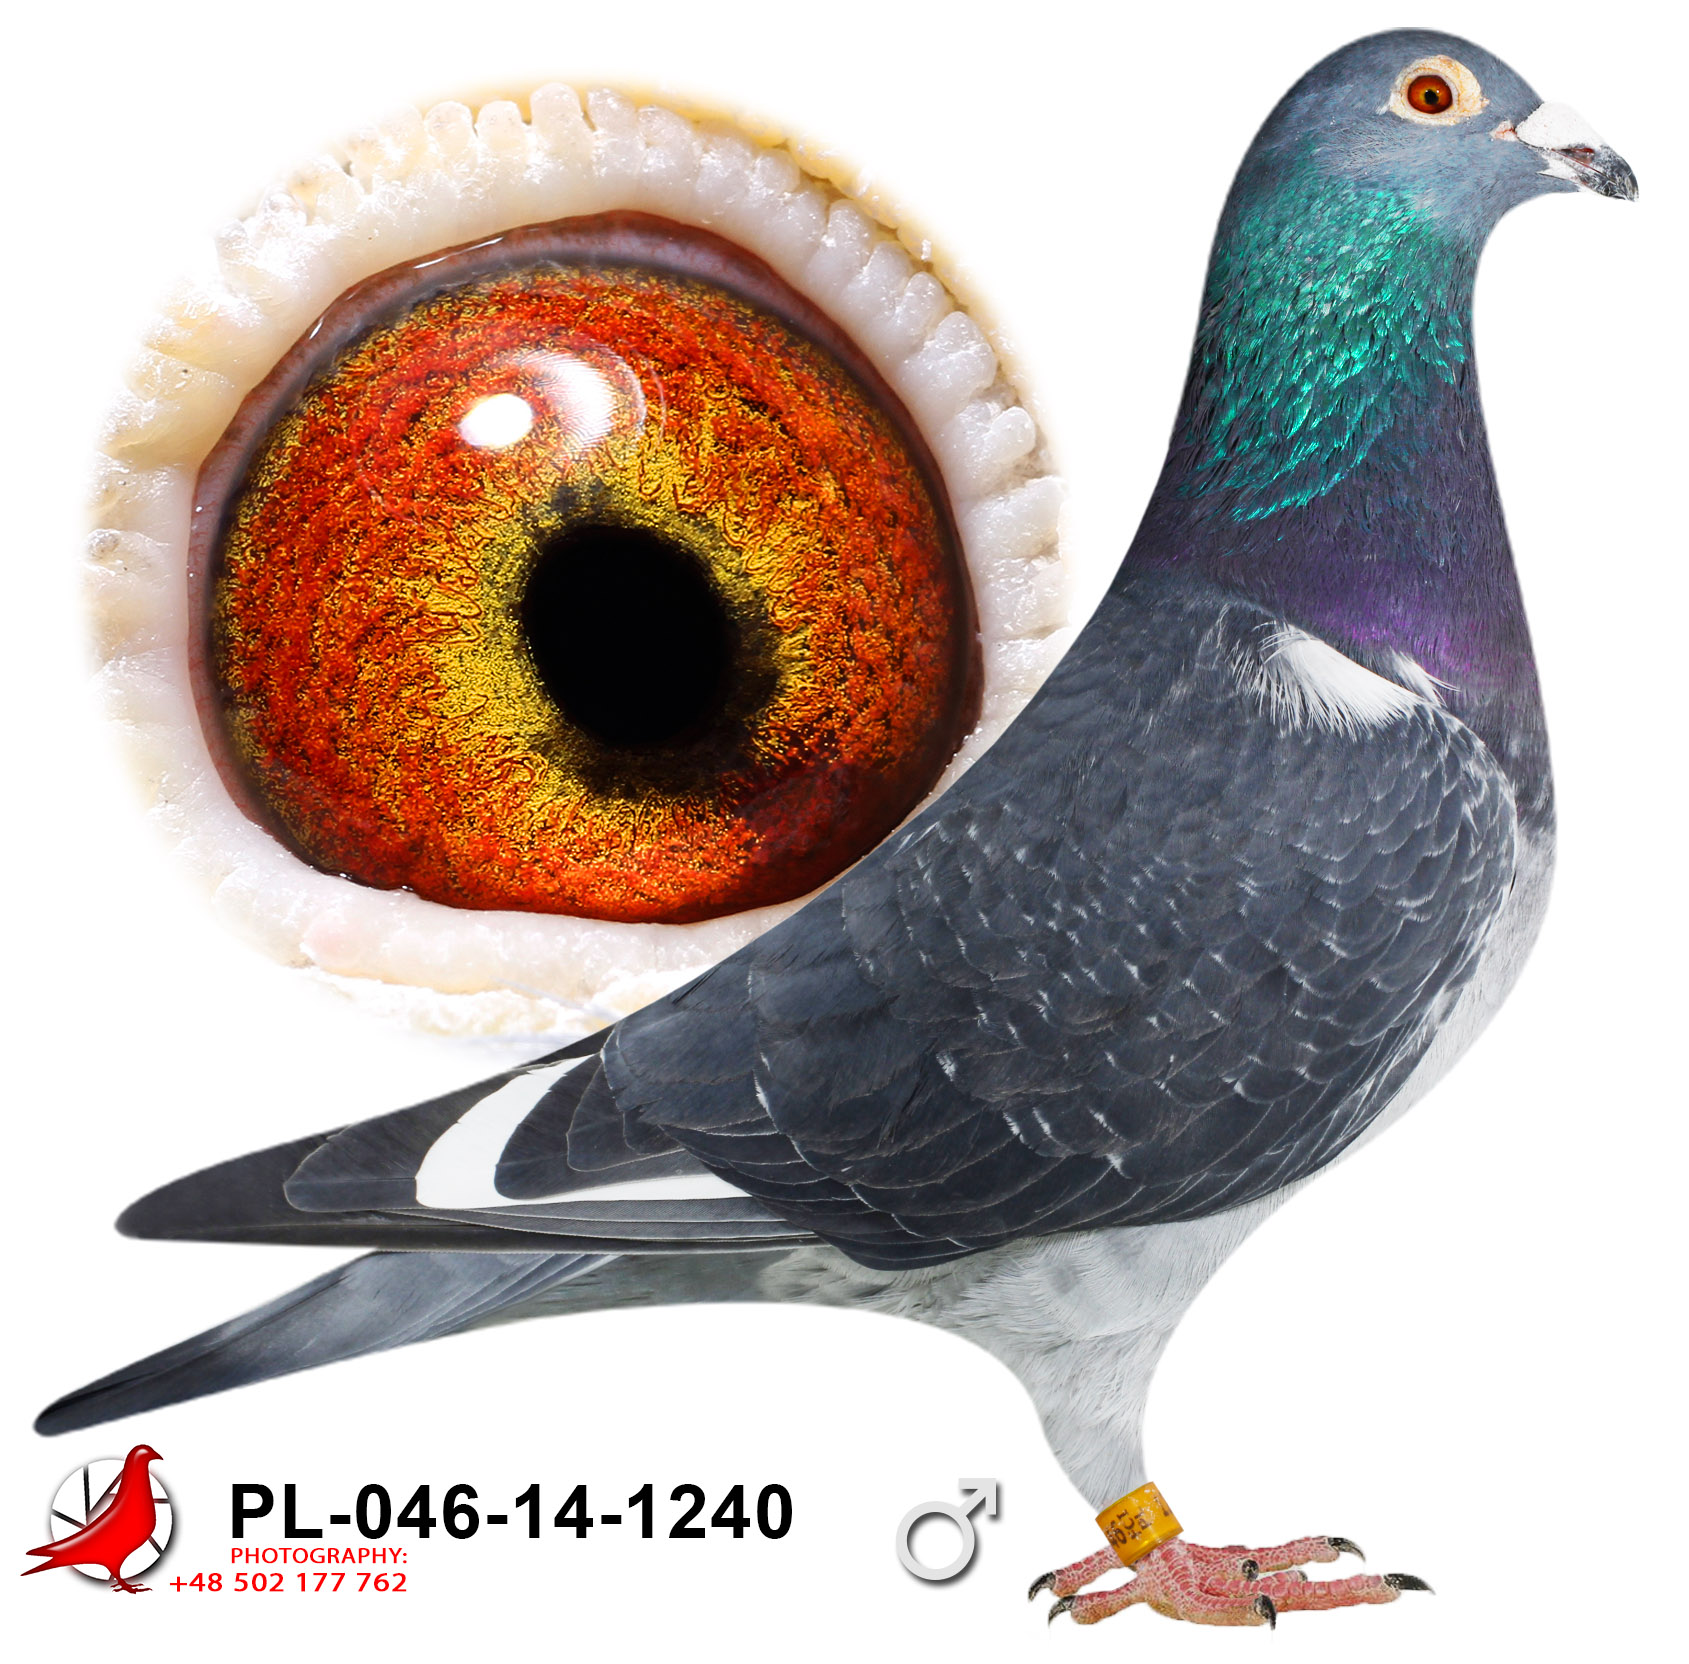 pl-046-14-1240_c